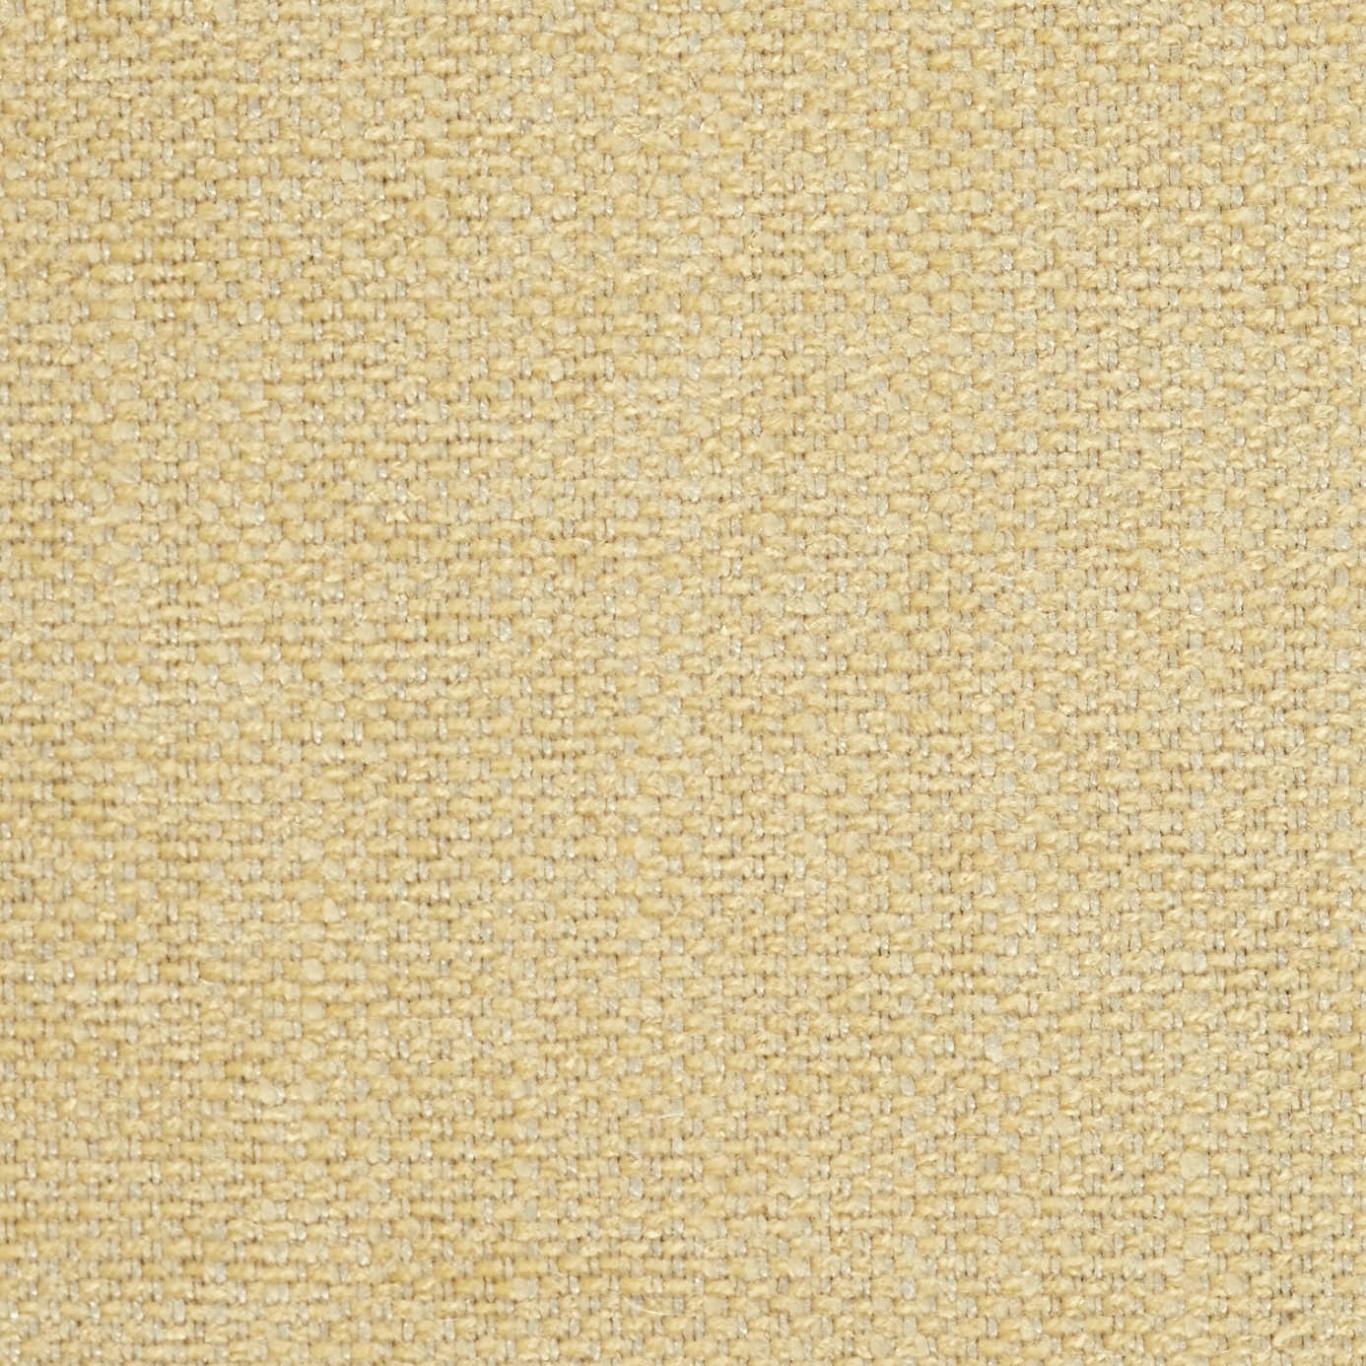 Image of Harlequin Molecule Honeycomb Fabric 440006